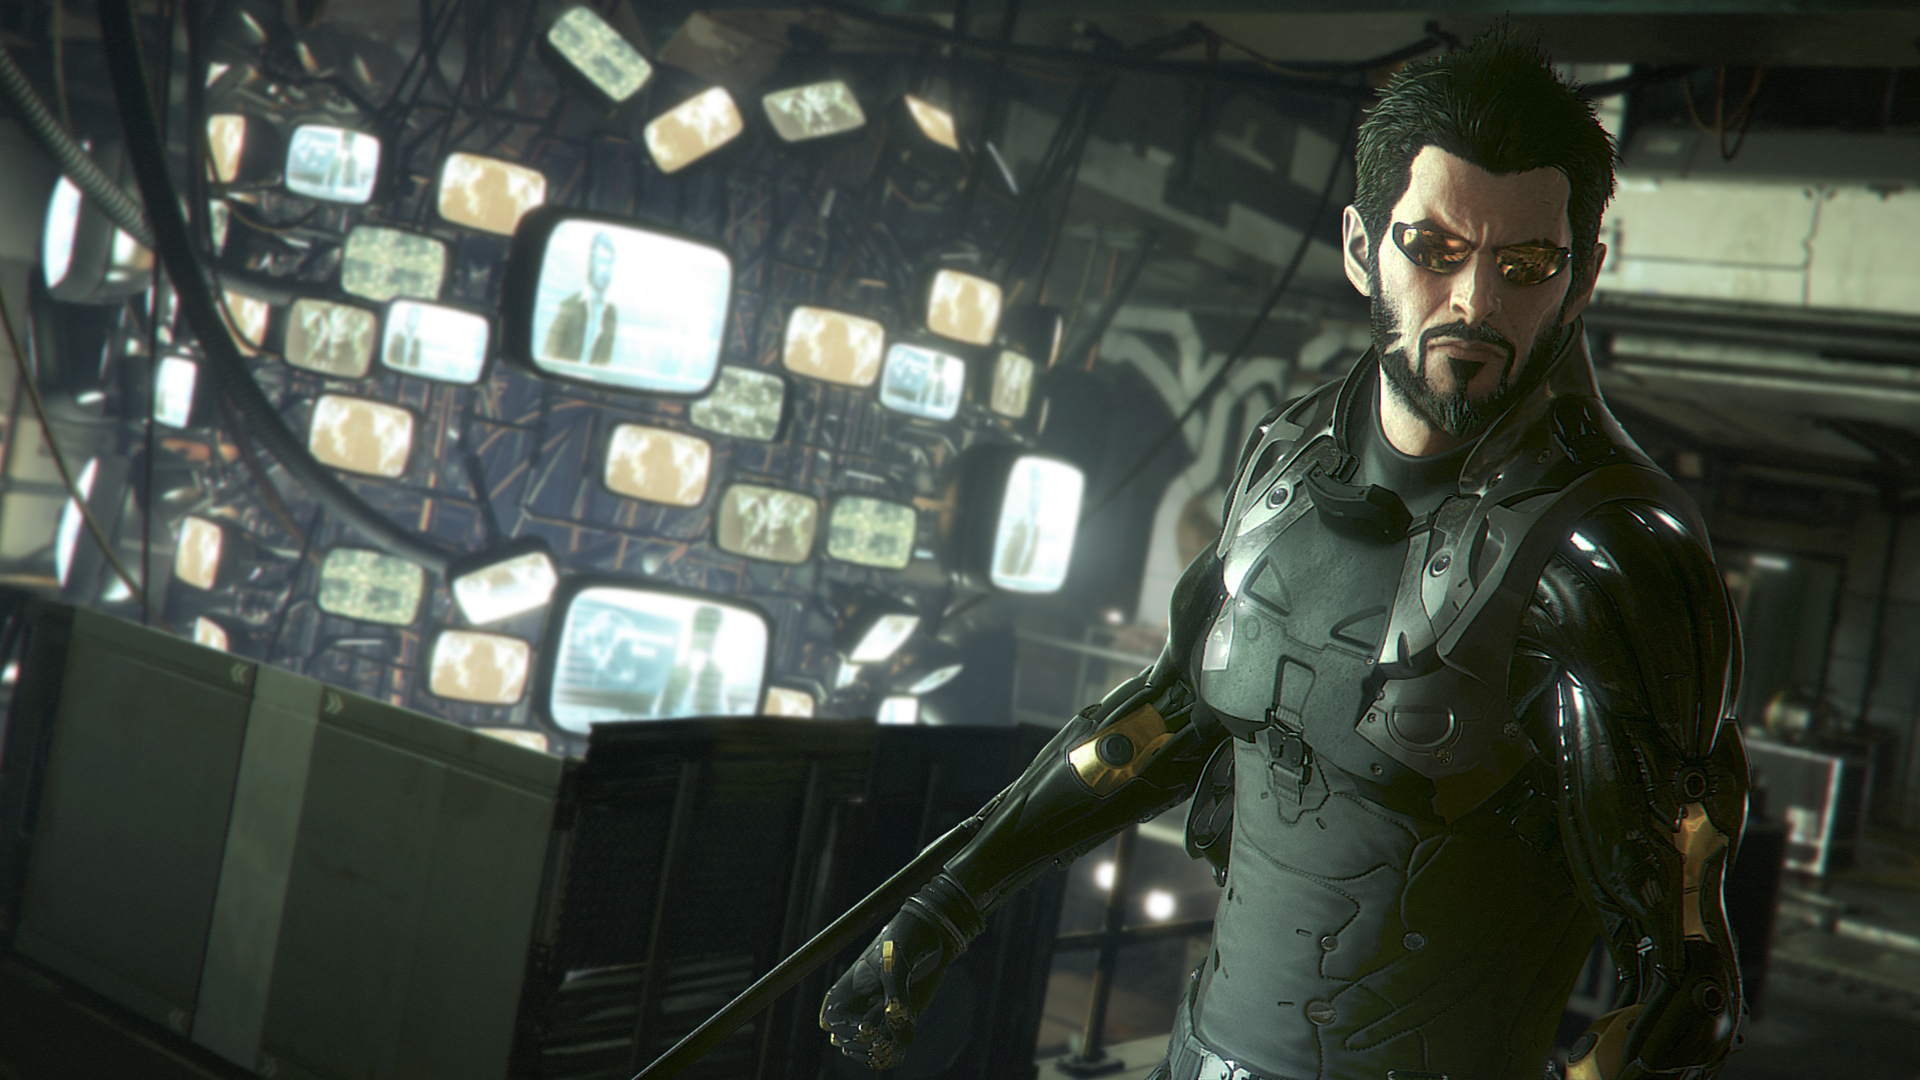 Deus Ex Mankind Divided ESPAÑOL Descargar Full (CPY) + REPACK 8 DVD5 (JPW) 7